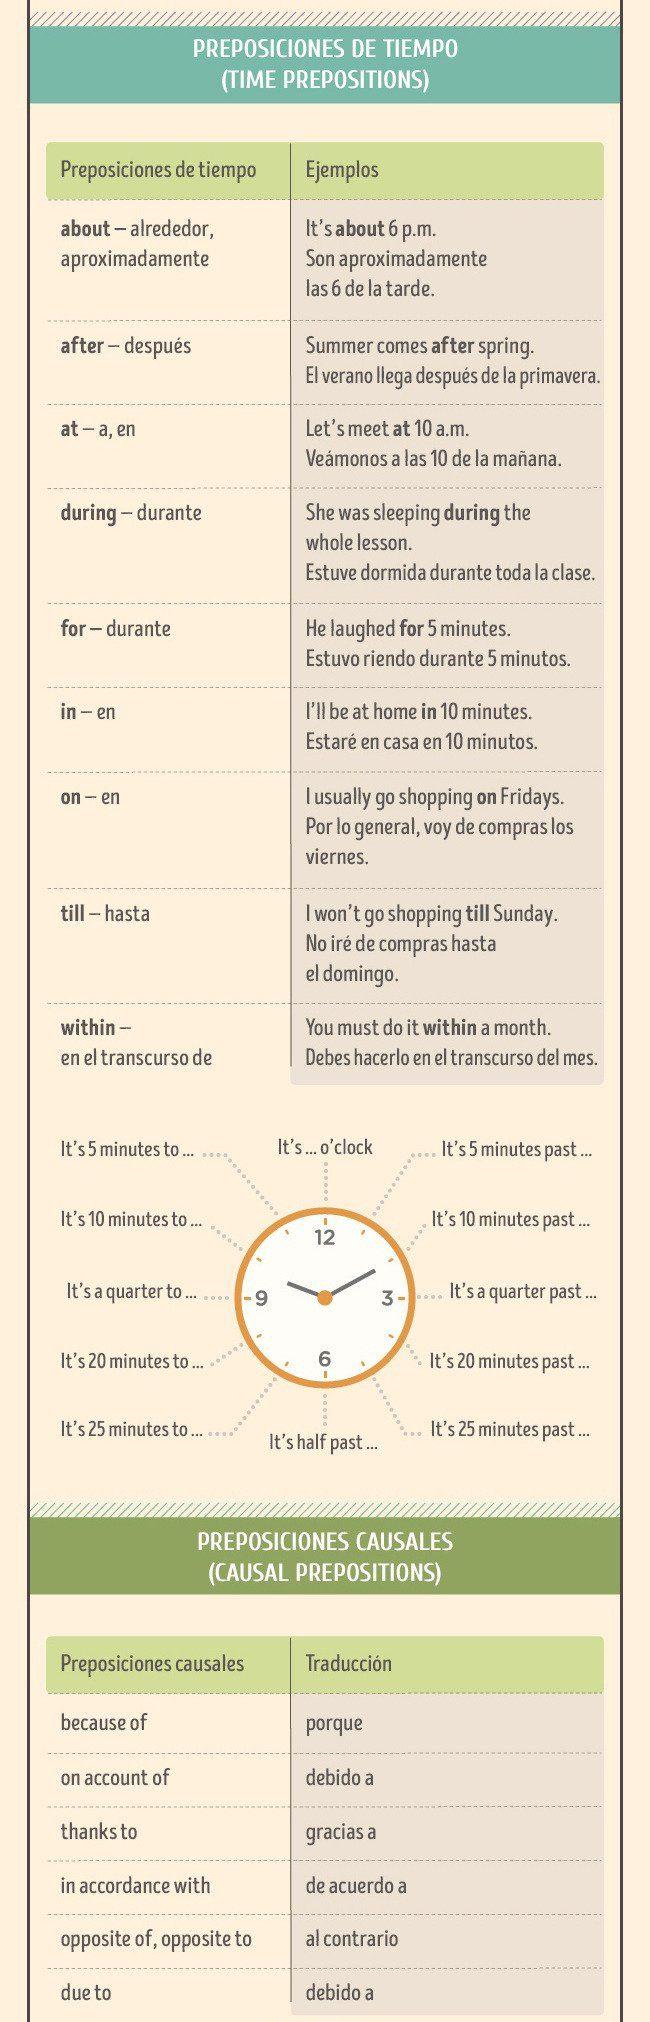 Aprende todo acerca del inglés sin salir de este post - Taringa!